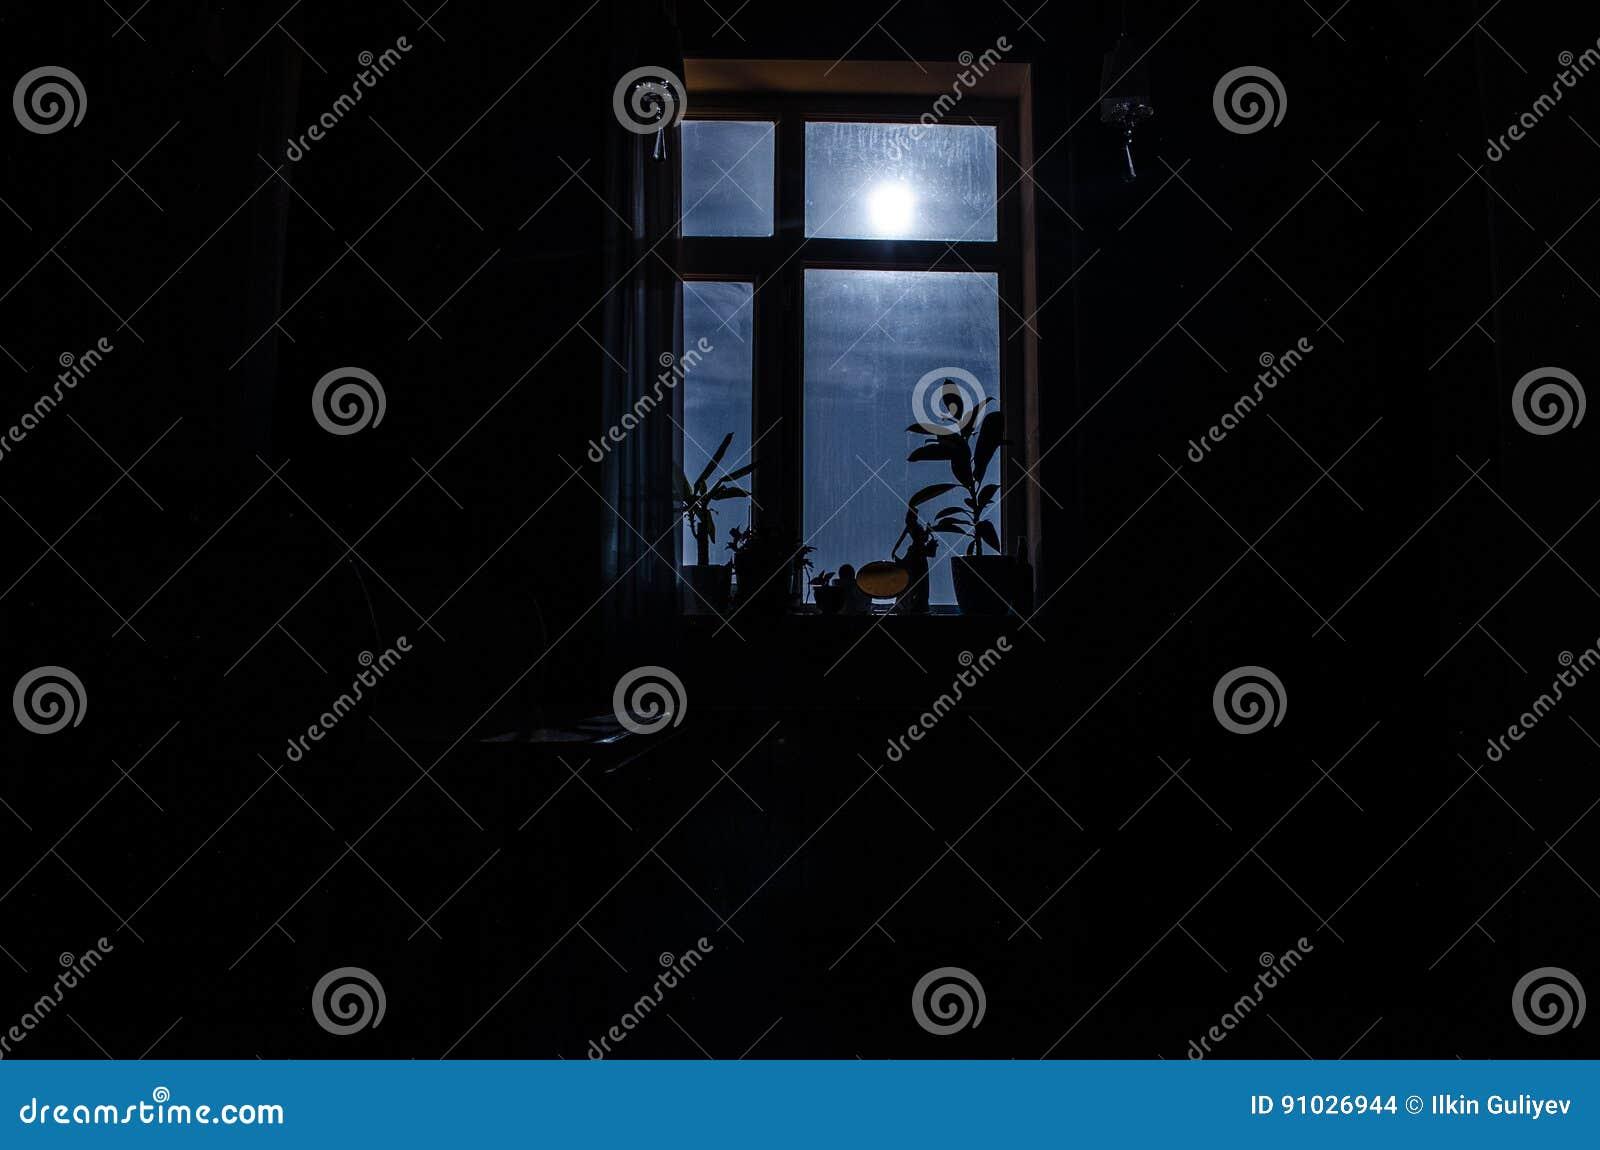 Window at night from inside - Night Scene Of Moon Seen Through The Window From Dark Room Stock Photo